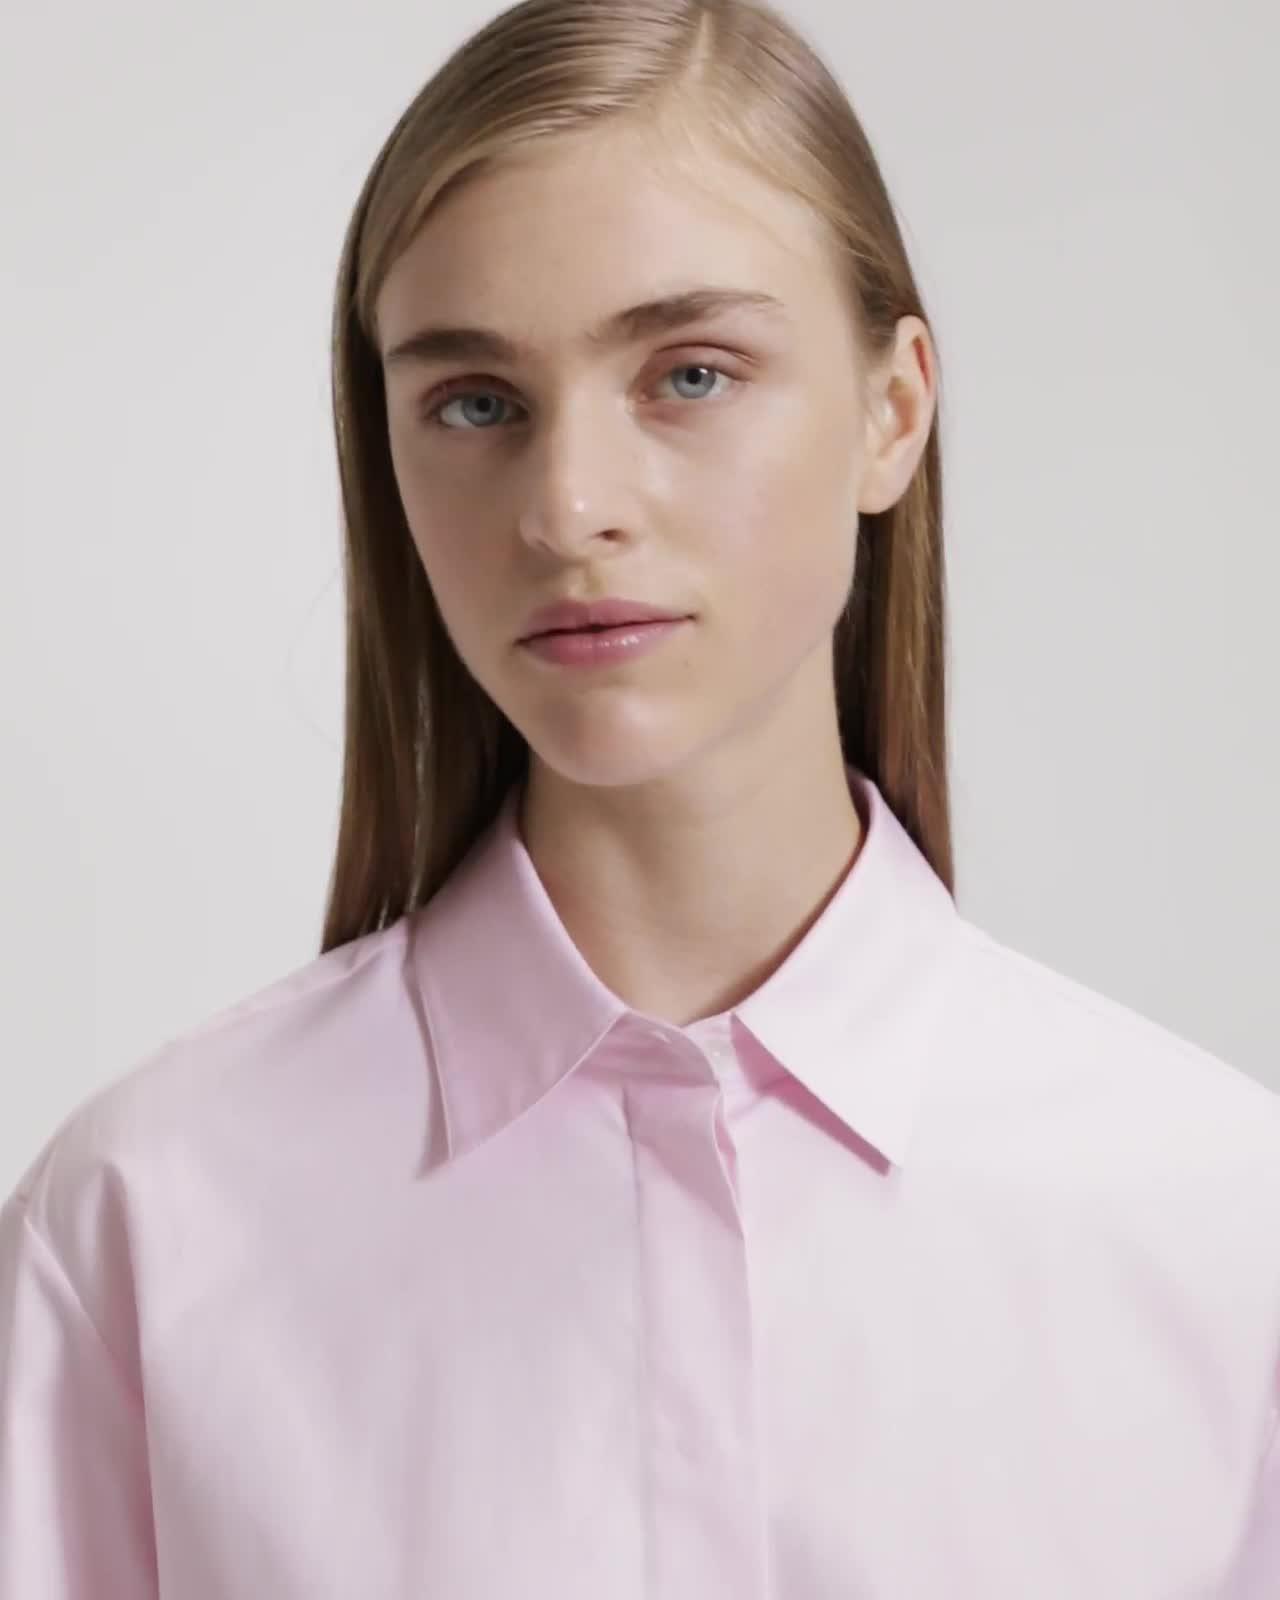 Classic Menswear Shirt